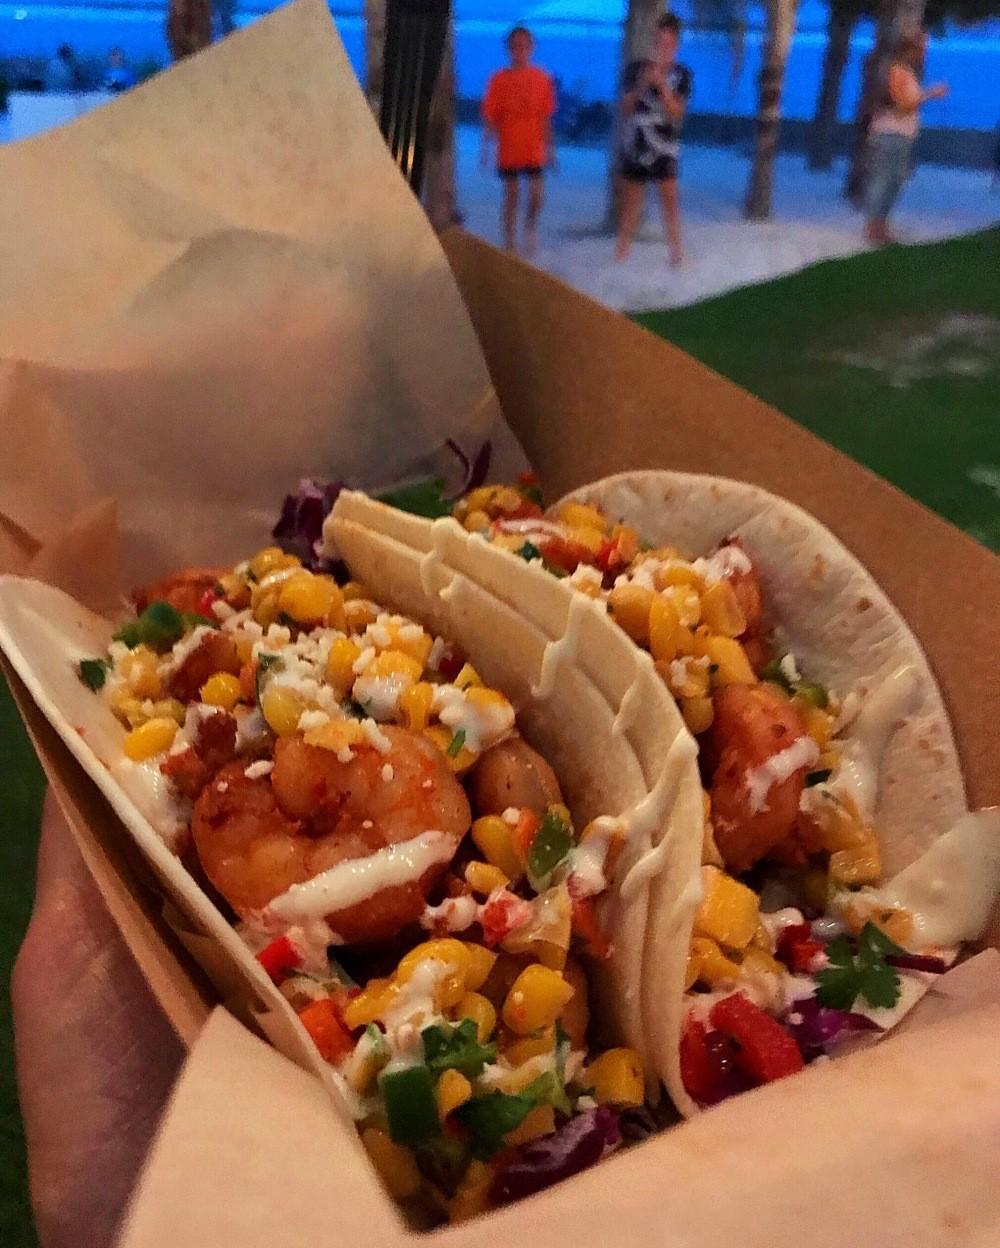 Shrimp tacos at The Gulf in Orange Beach Alabama Photo Heatheronhertravels